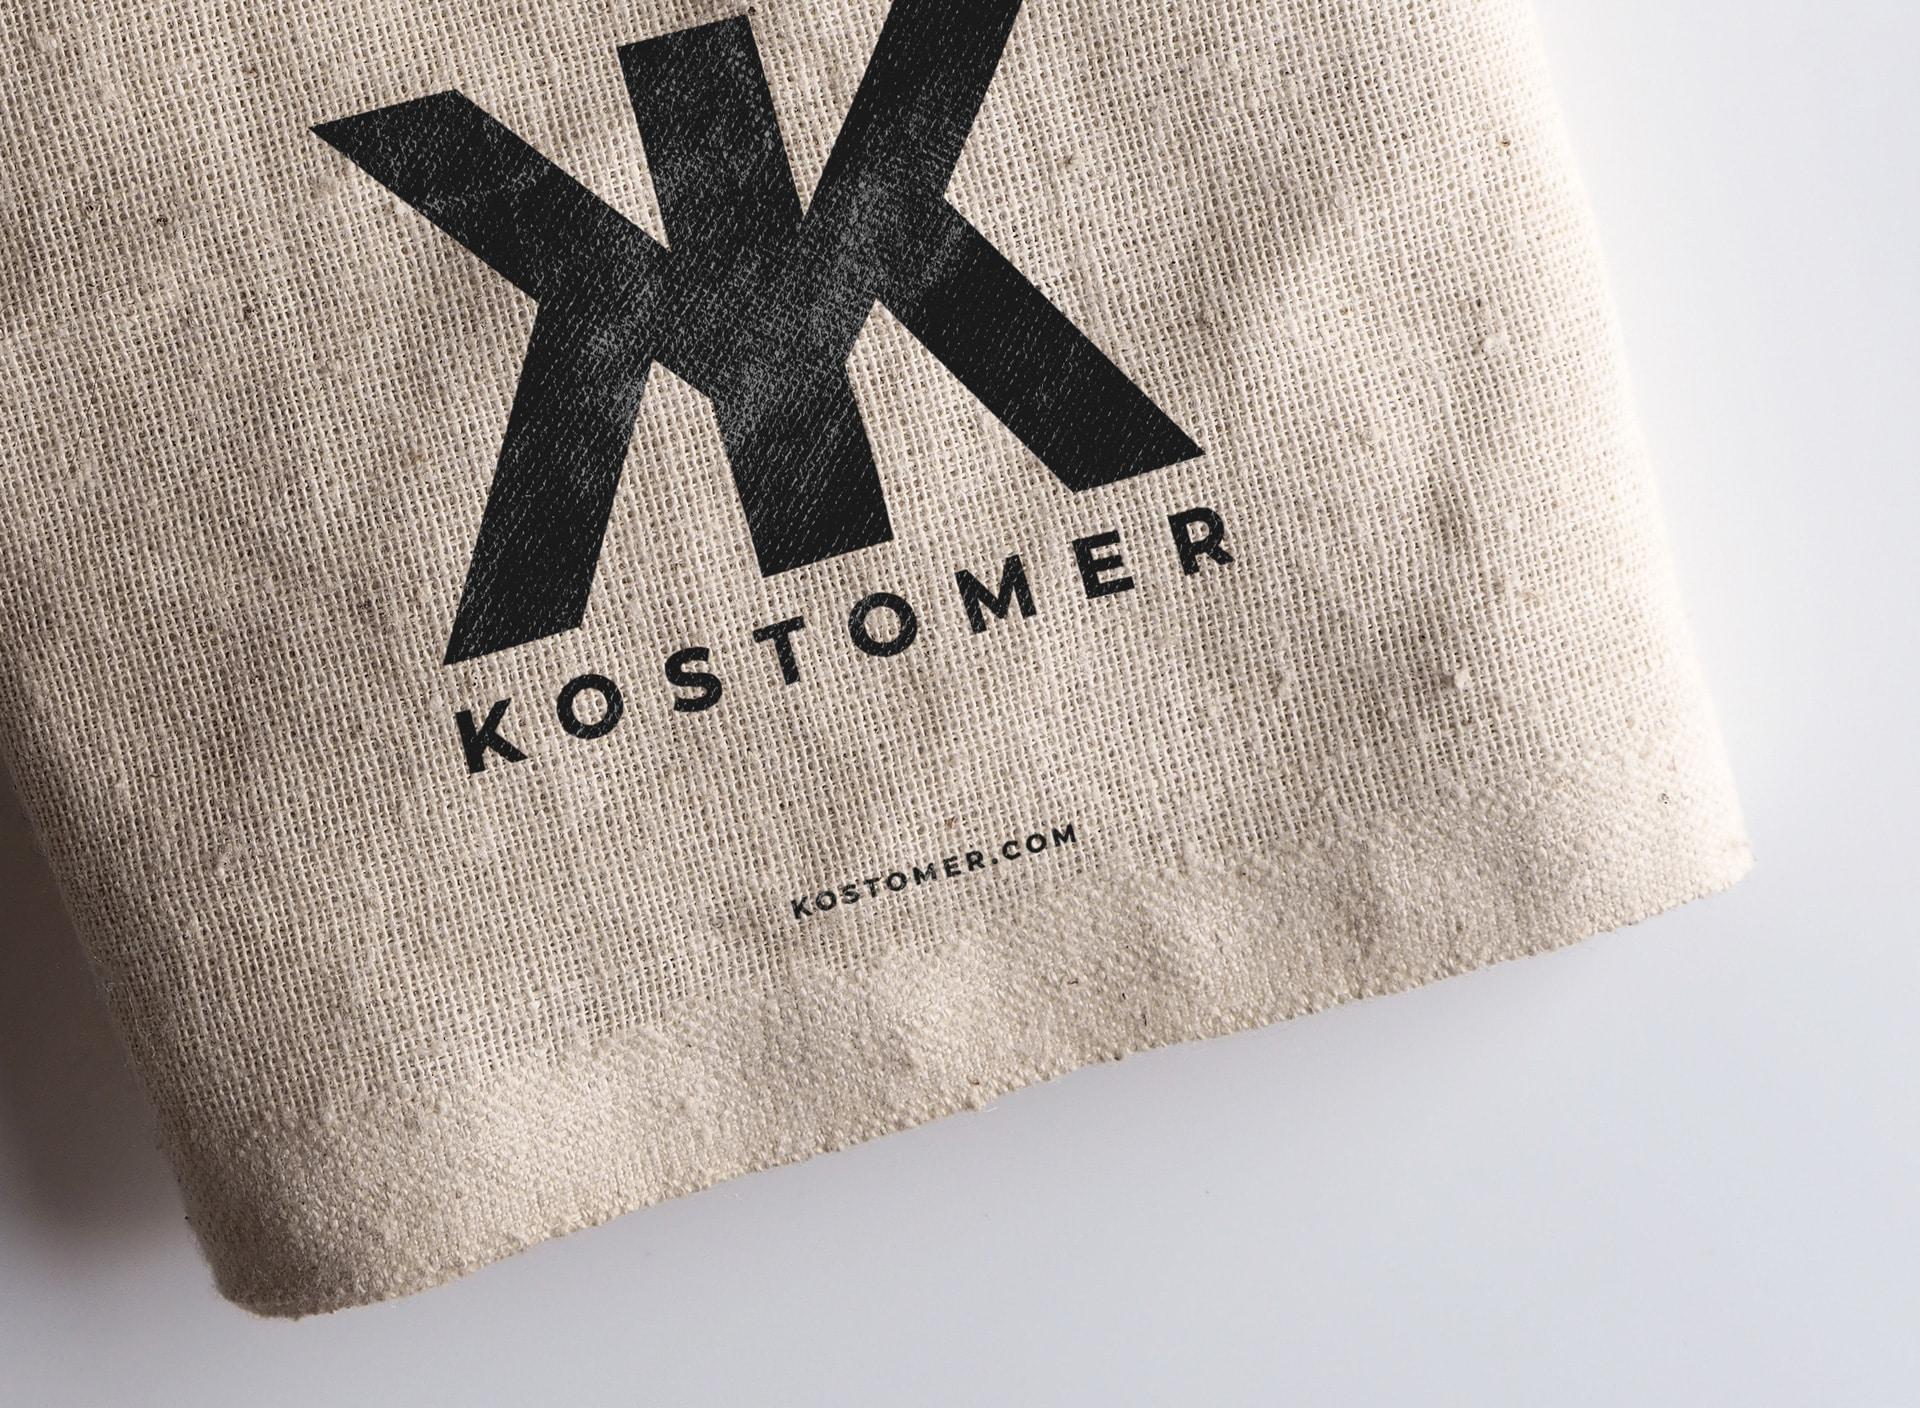 KOSTOMER-Vintage-Fabric-Mockup